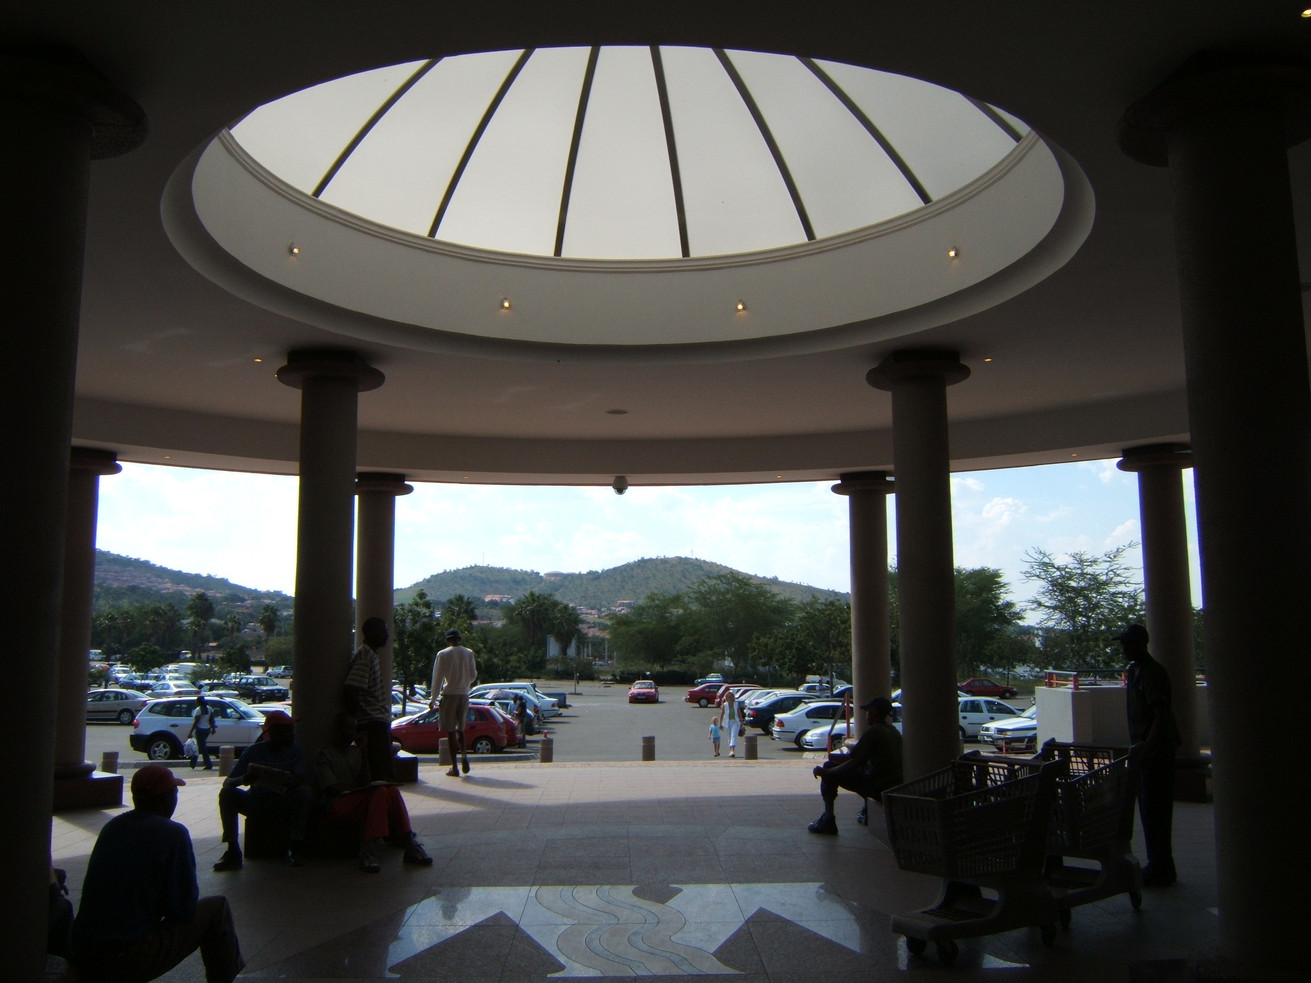 Round Segmented Dome - Waterfall Mall